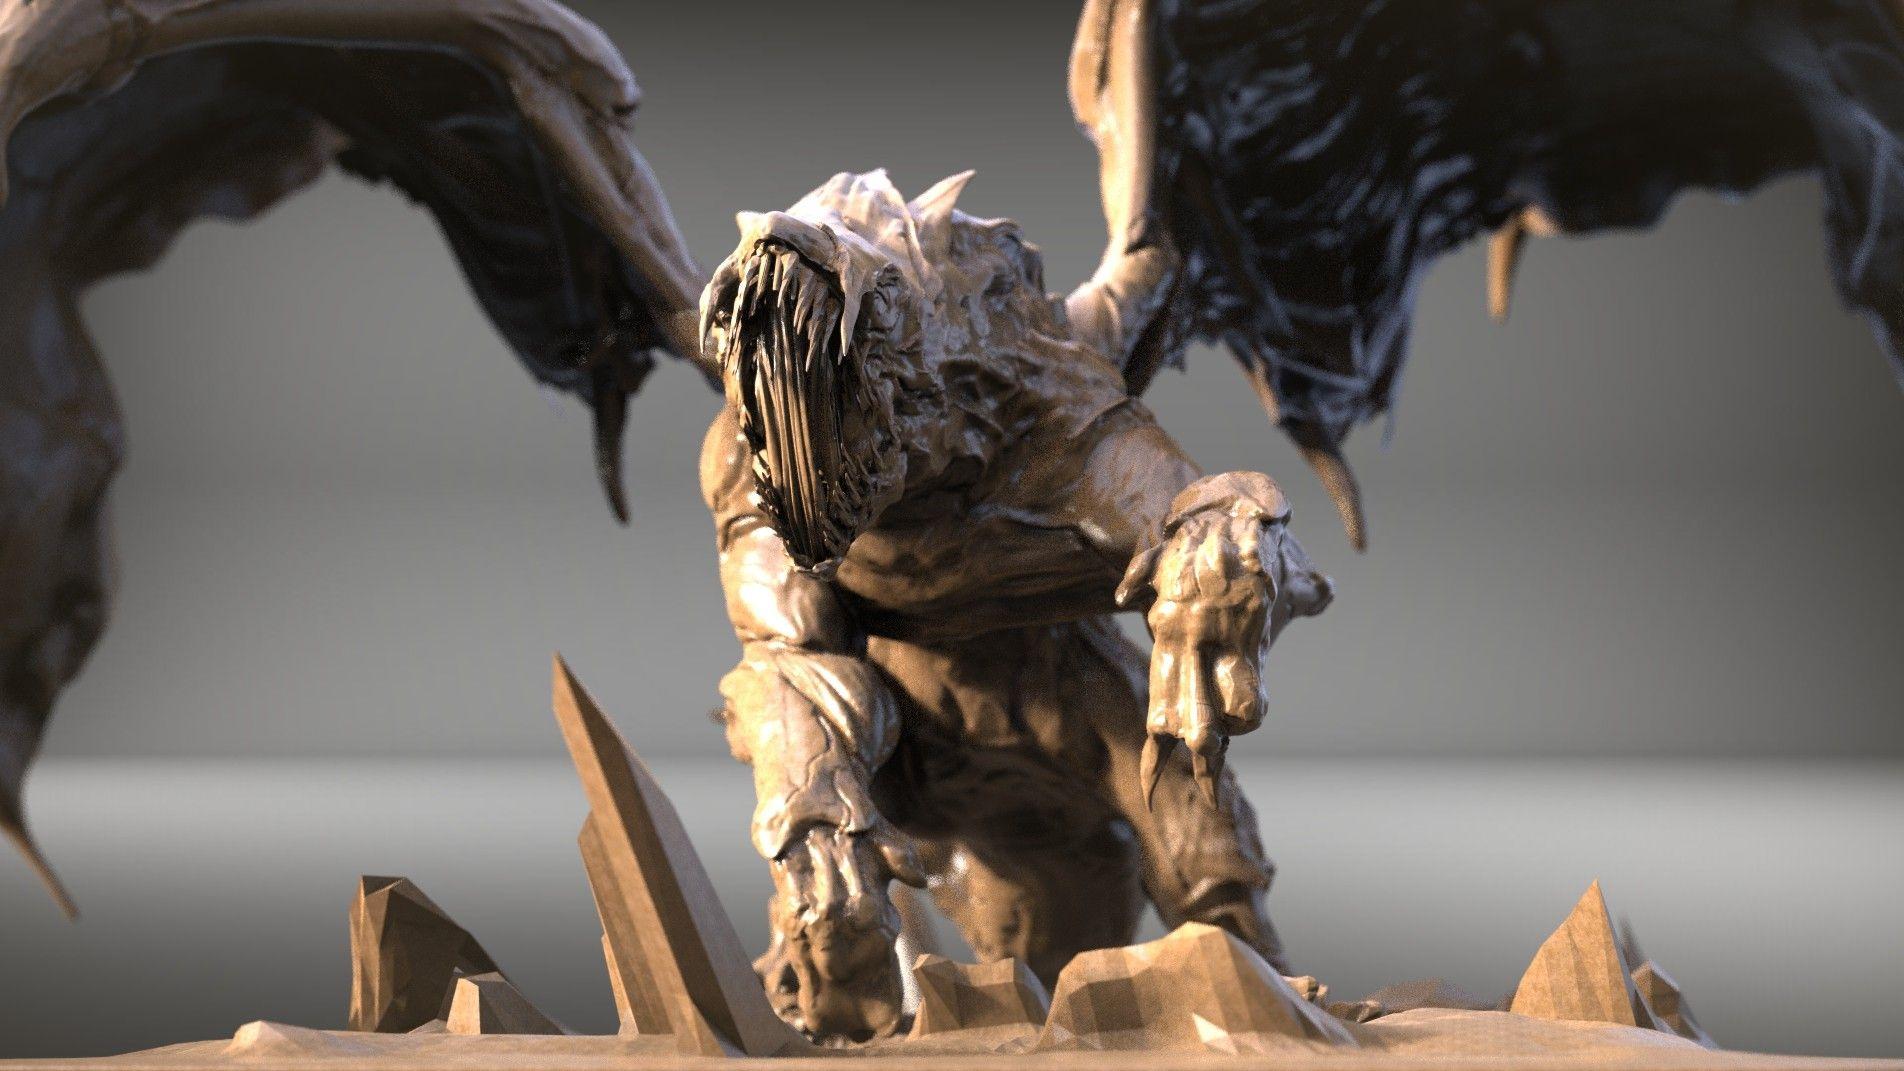 ArtStation - Creature type Dragon, keita okada